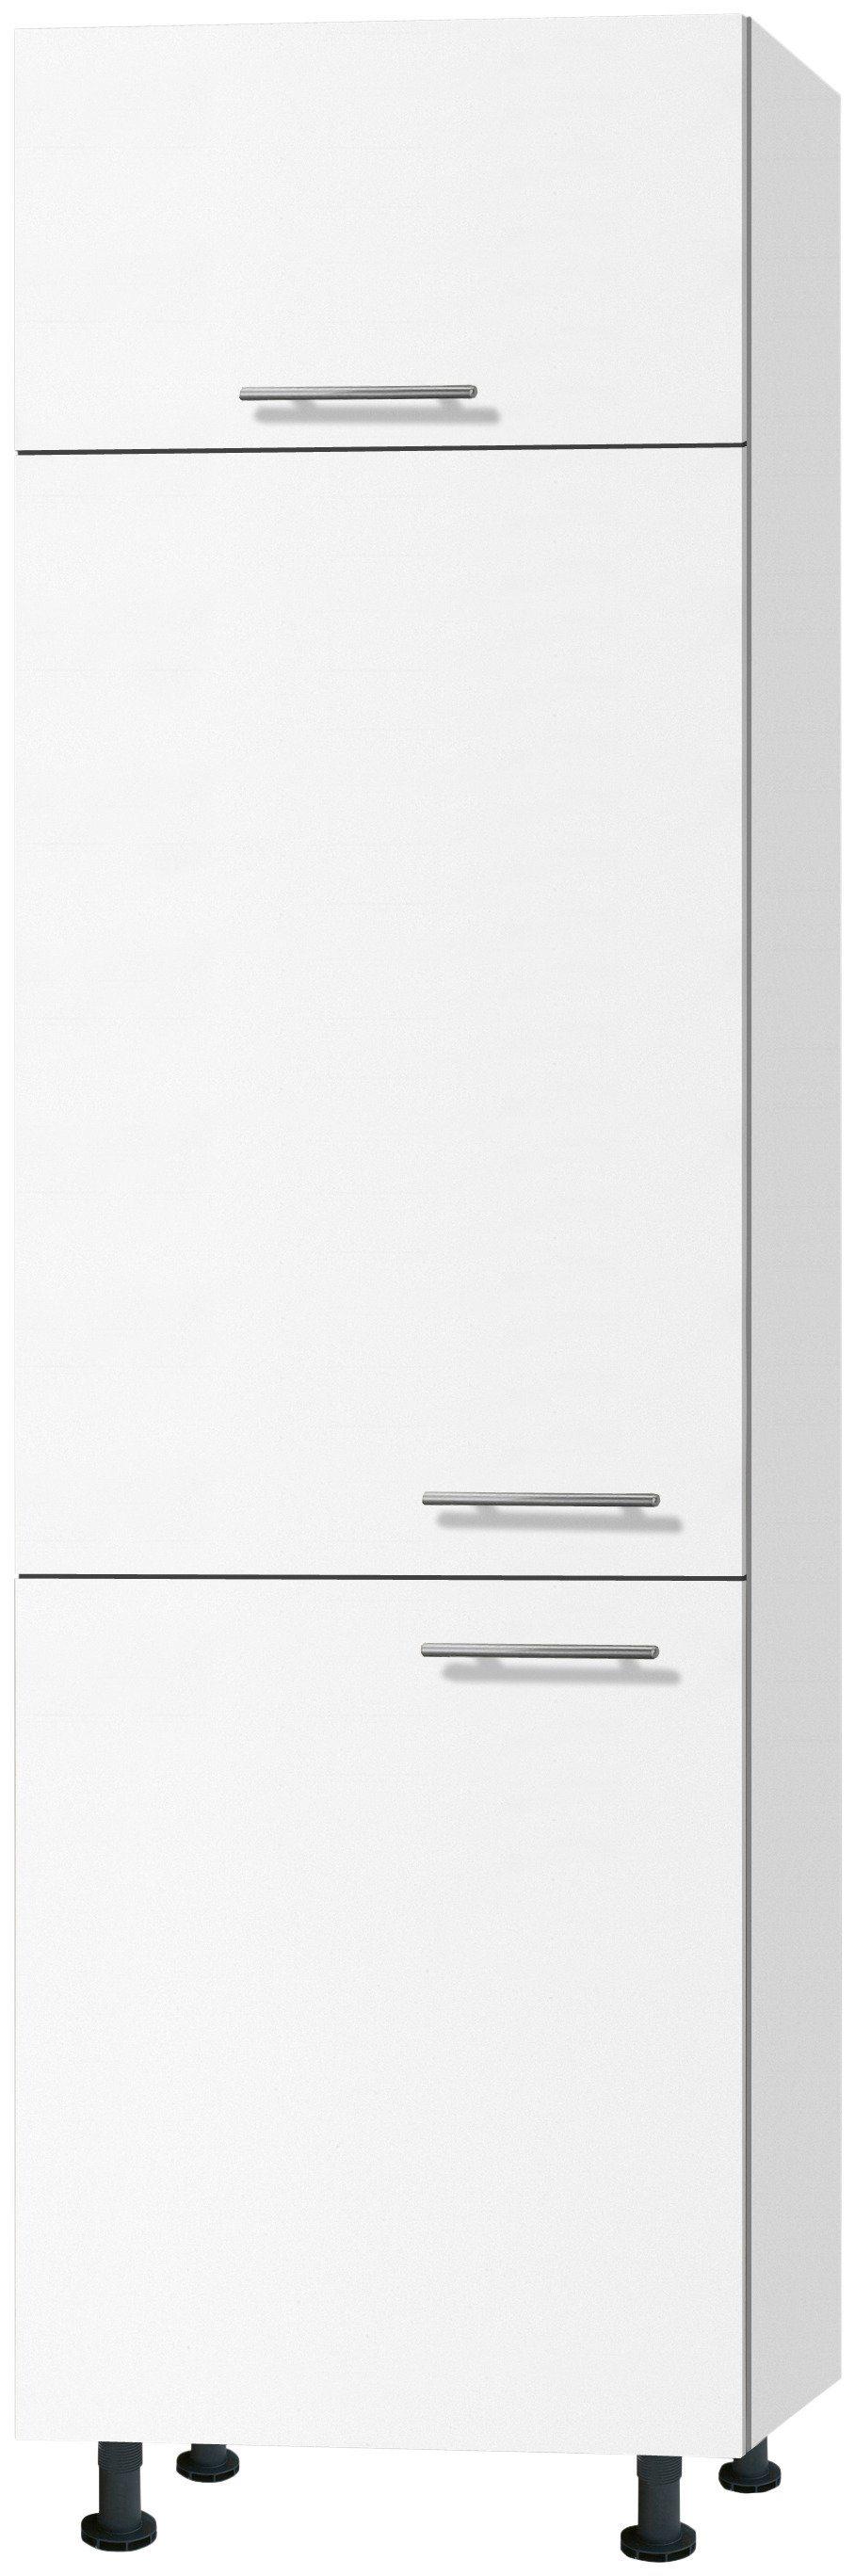 OPTIFIT Kühlumbauschrank »Michel, Höhe 211,8 cm«